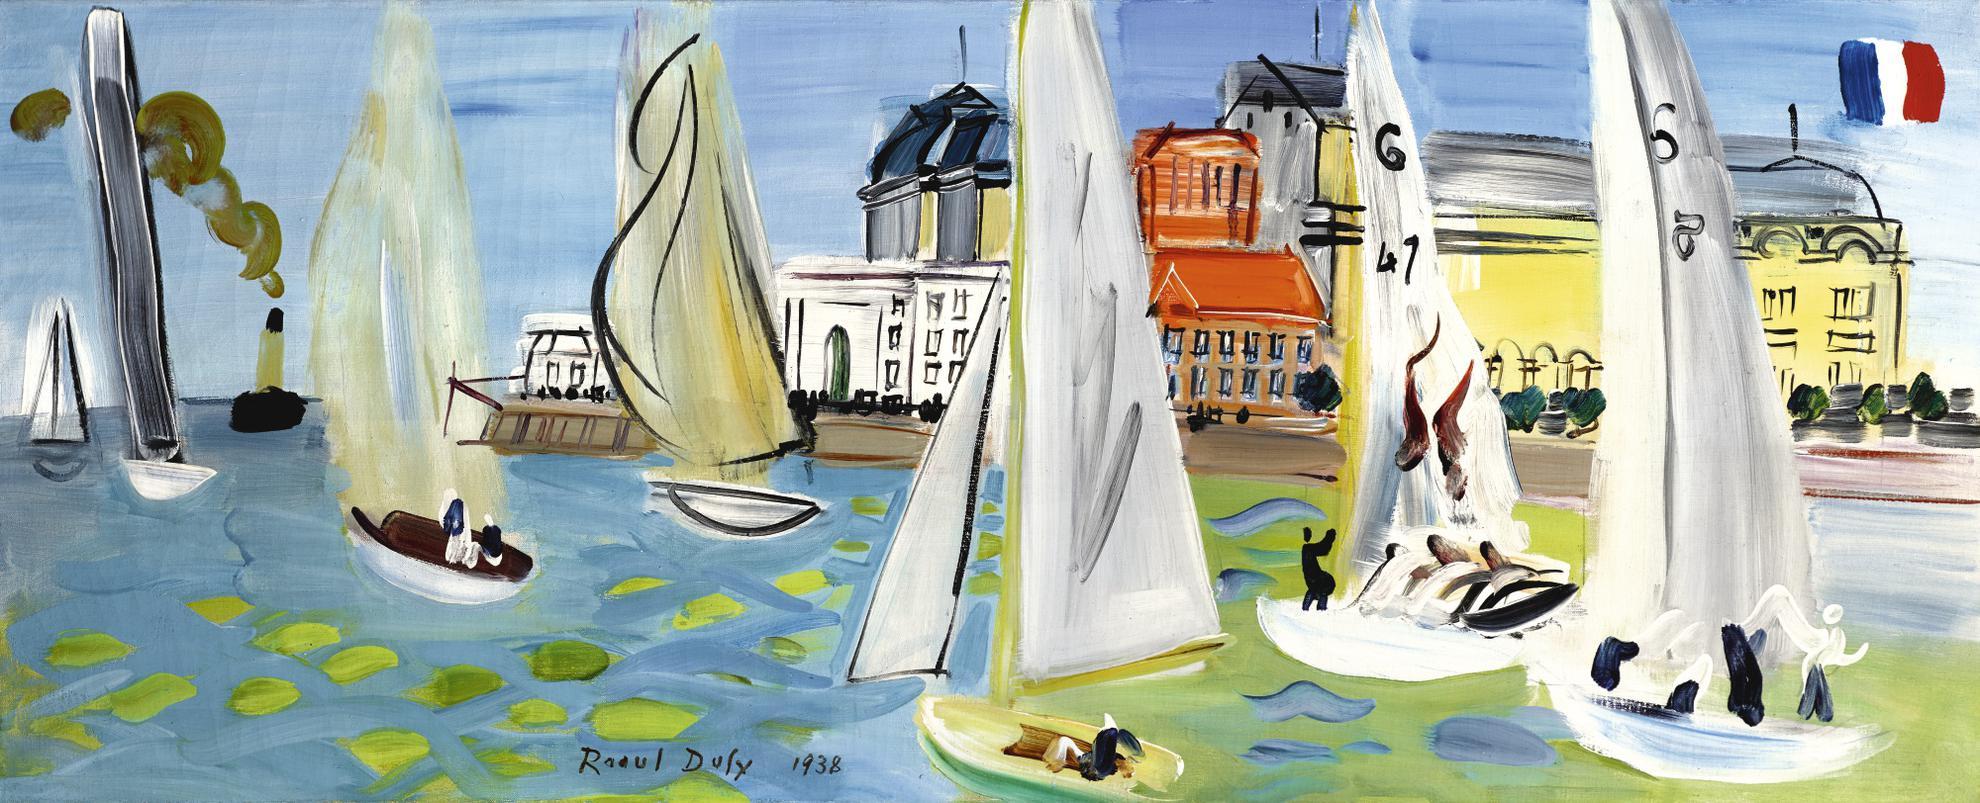 Raoul Dufy-Regates (Le Bassin De Deauville)-1938